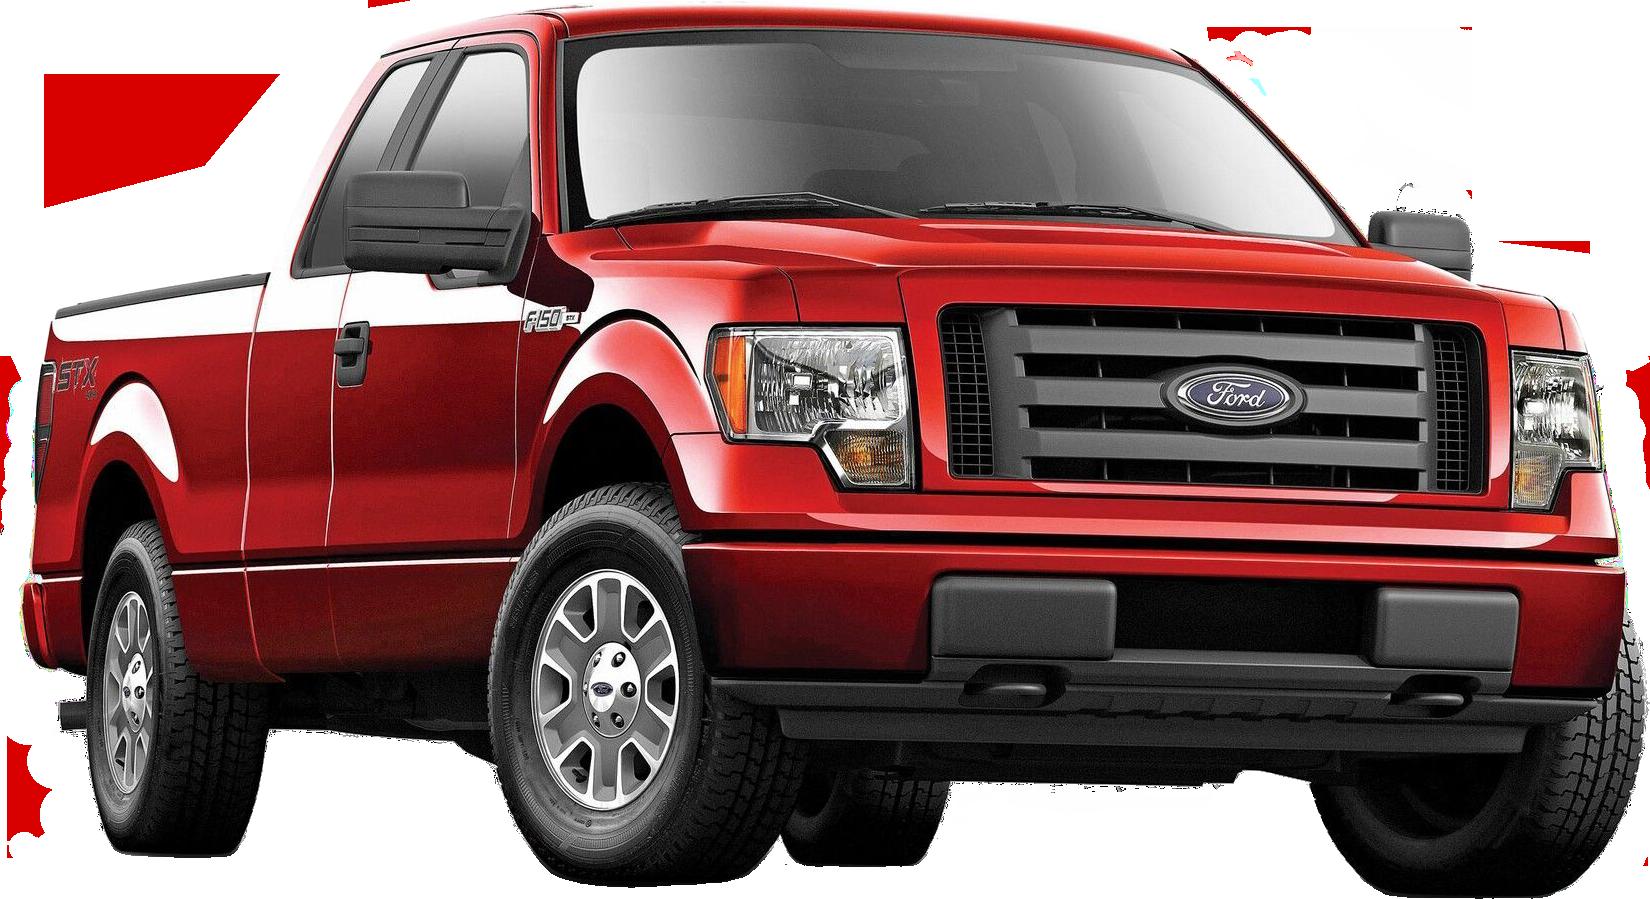 Gmc Chev Fanatics Gmcguys On Twitter Pickup Trucks Old Ford Truck Ford Trucks 2017